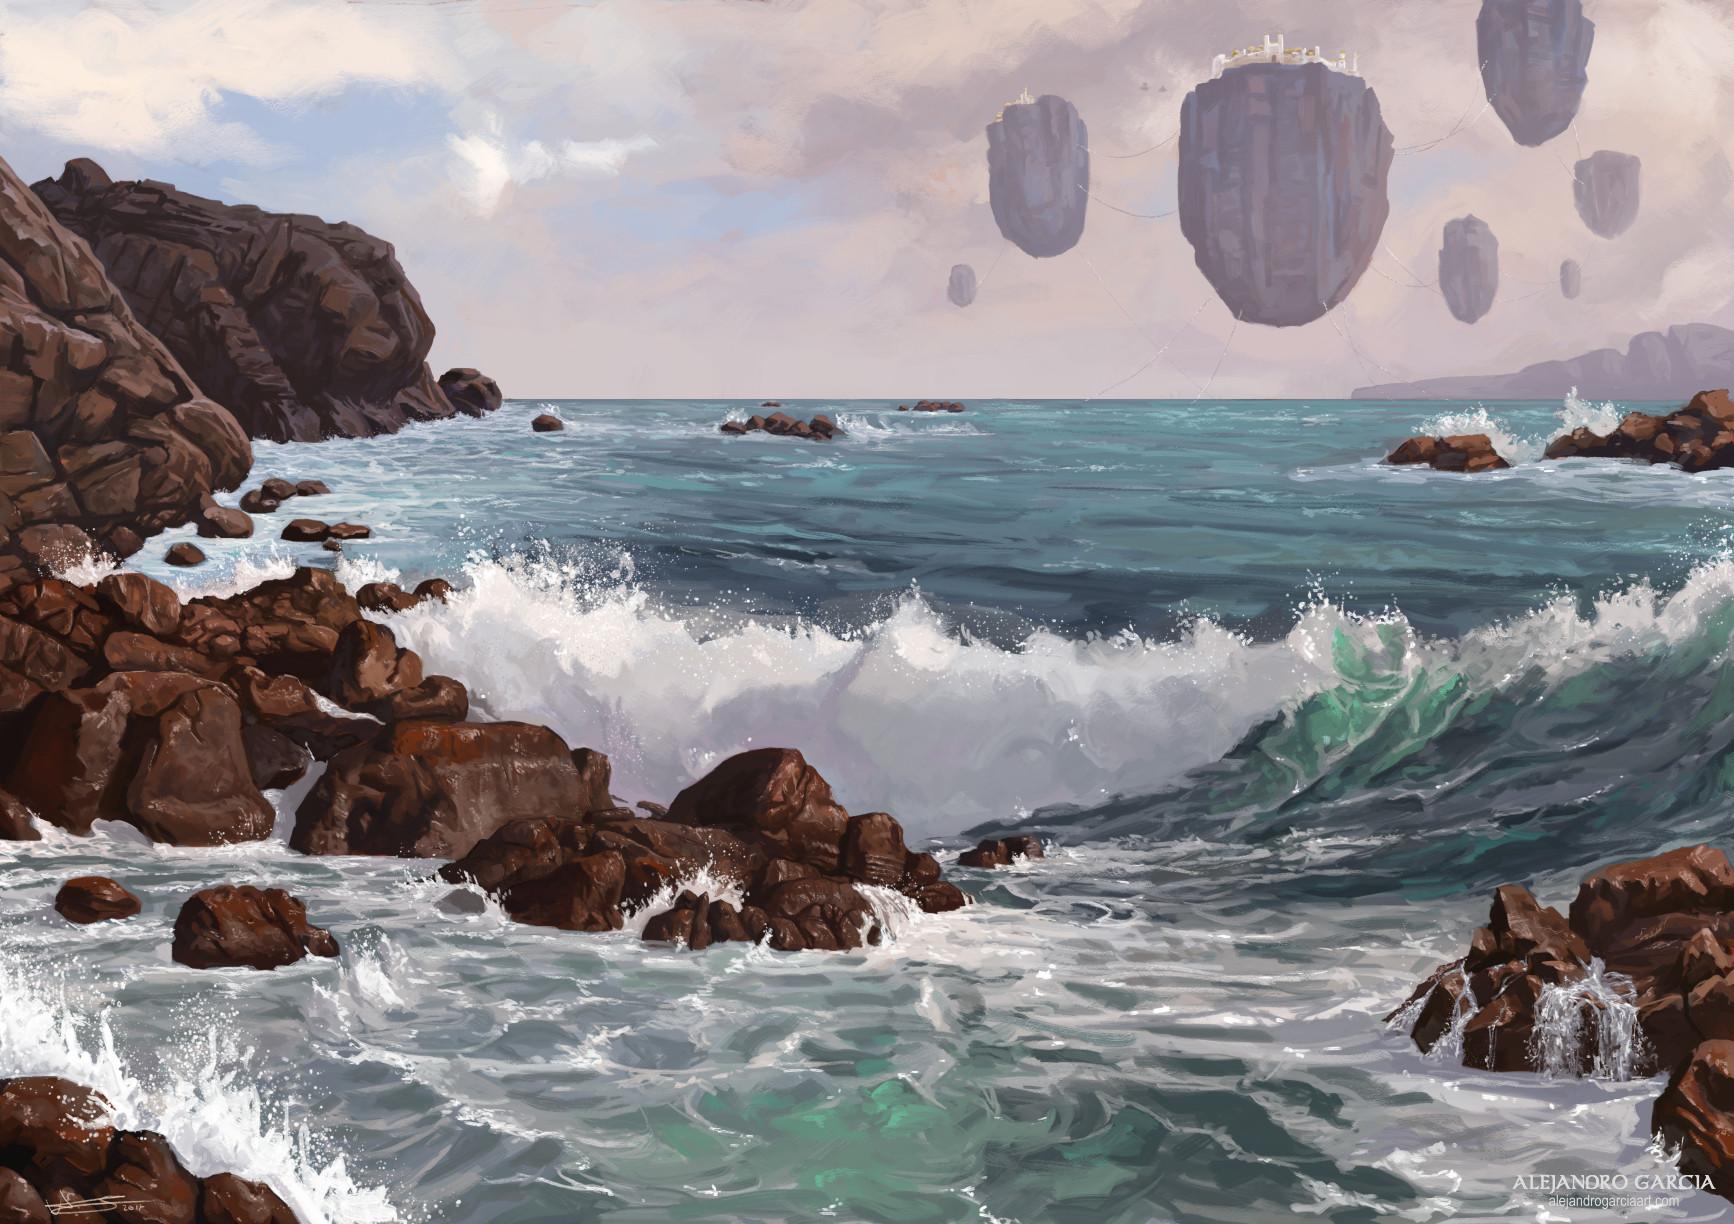 Floaty rocks on the coast